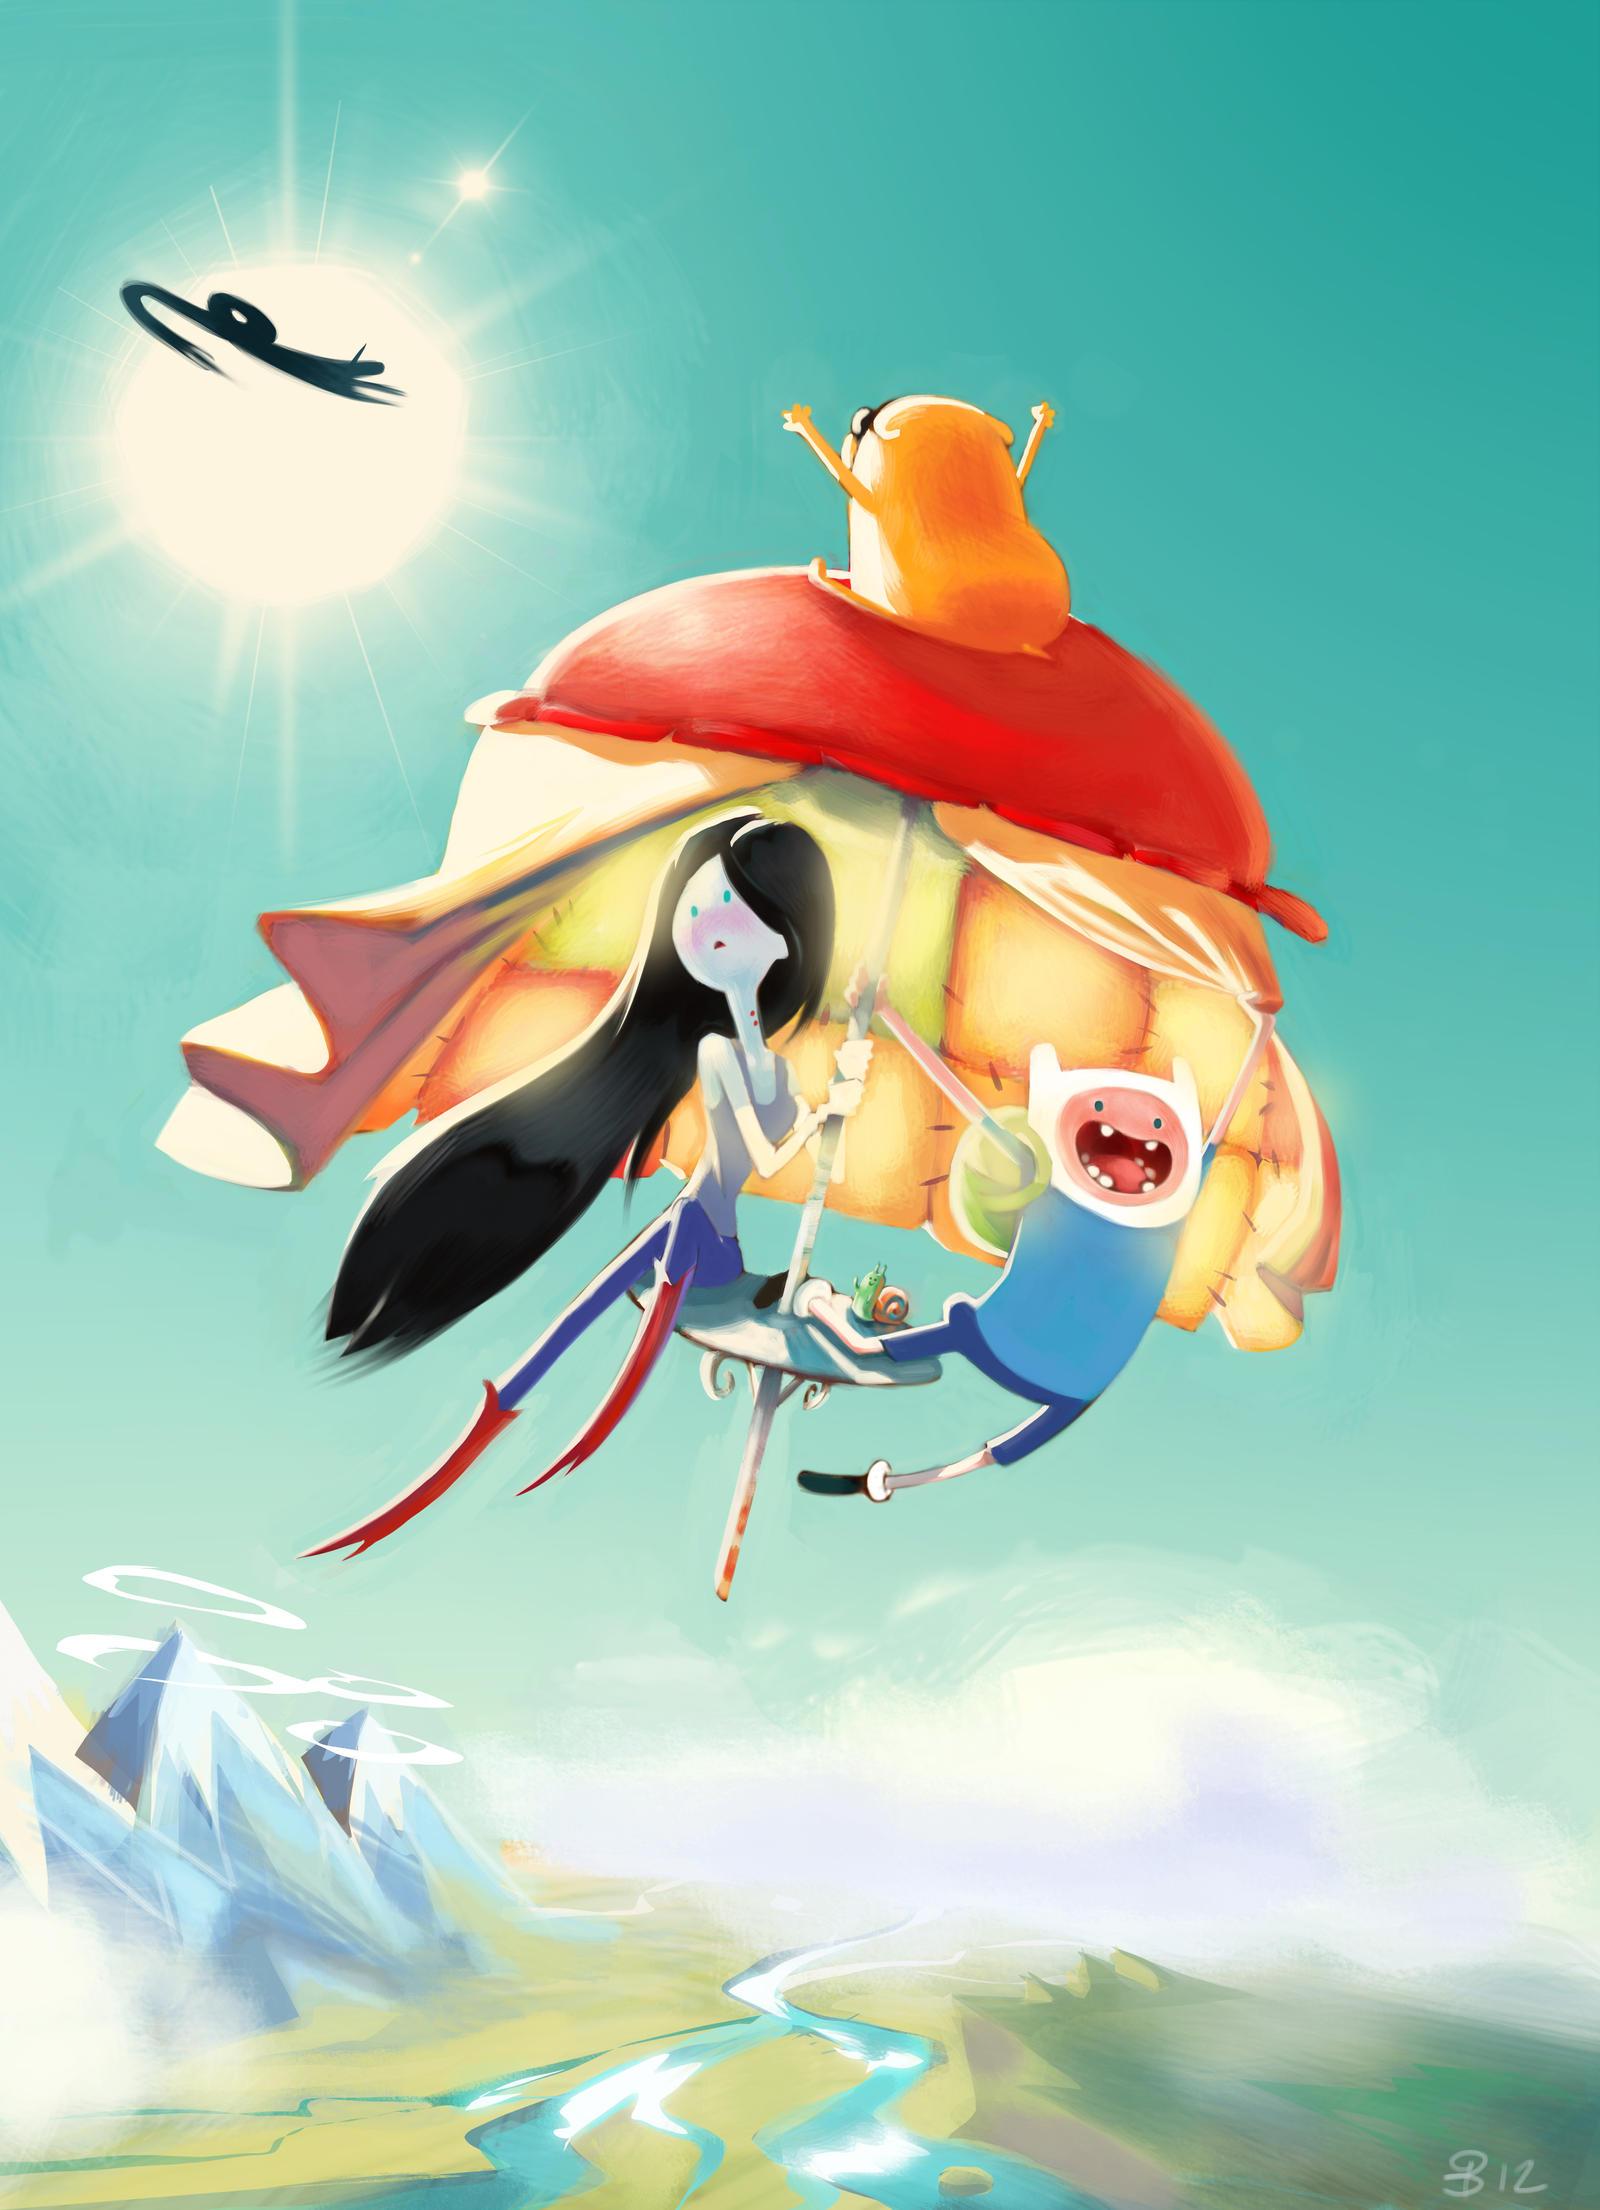 Adventure time - Marceline and Finn